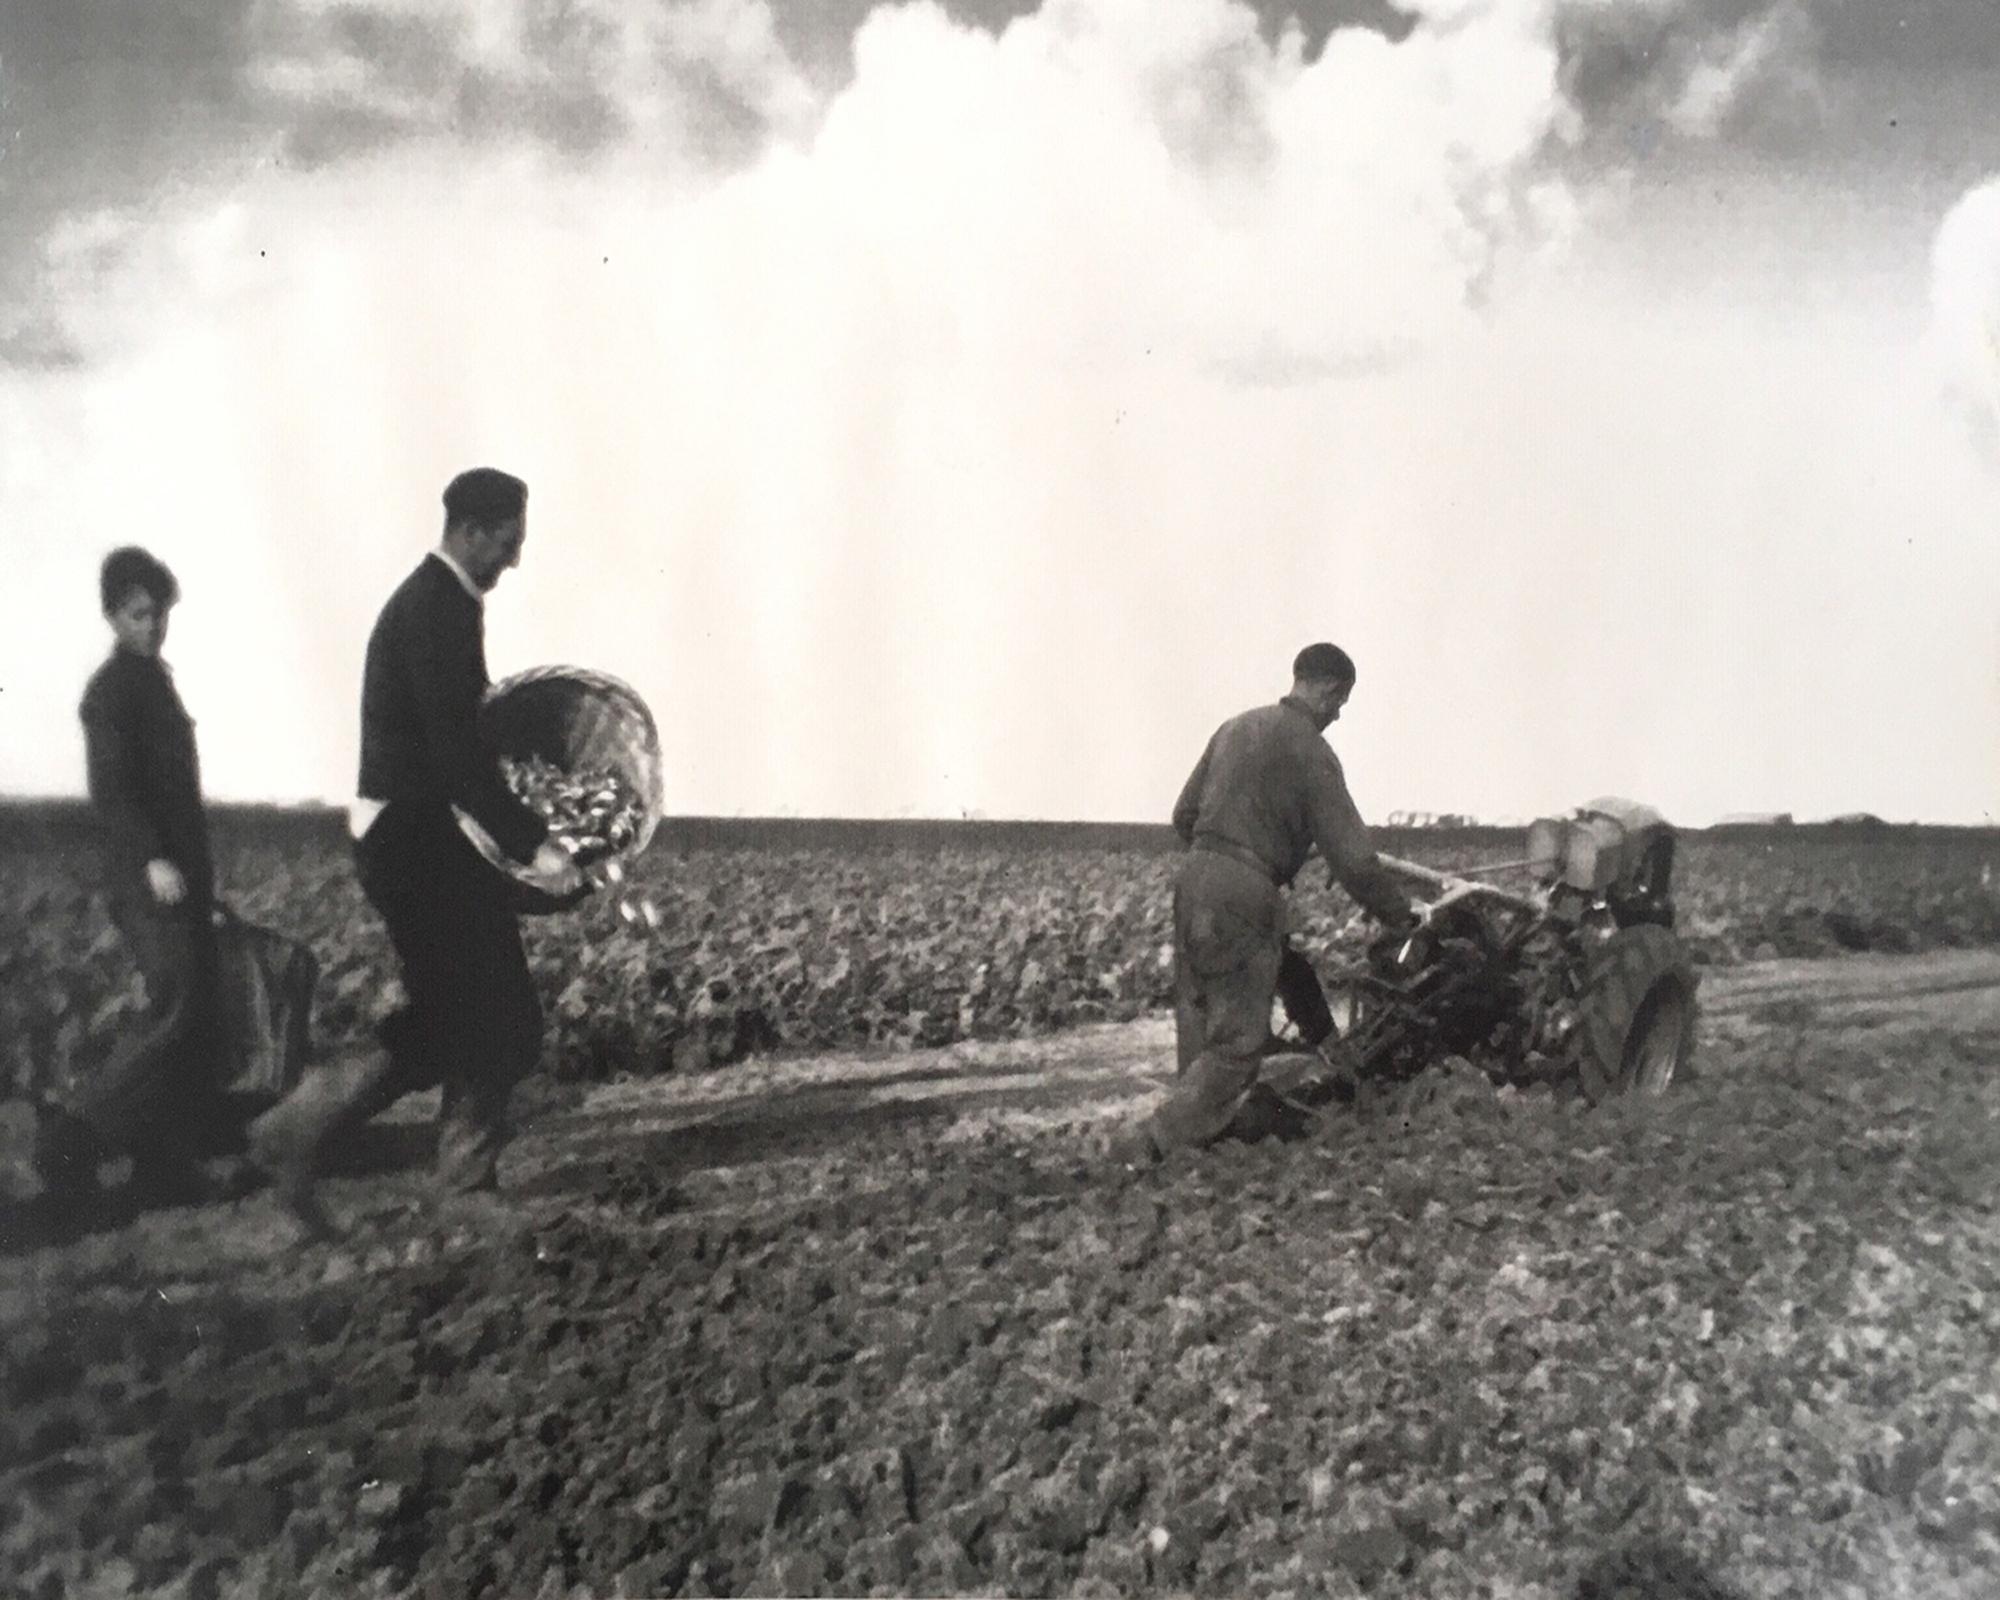 De pionieer, Wilhelmus Sr. planting.